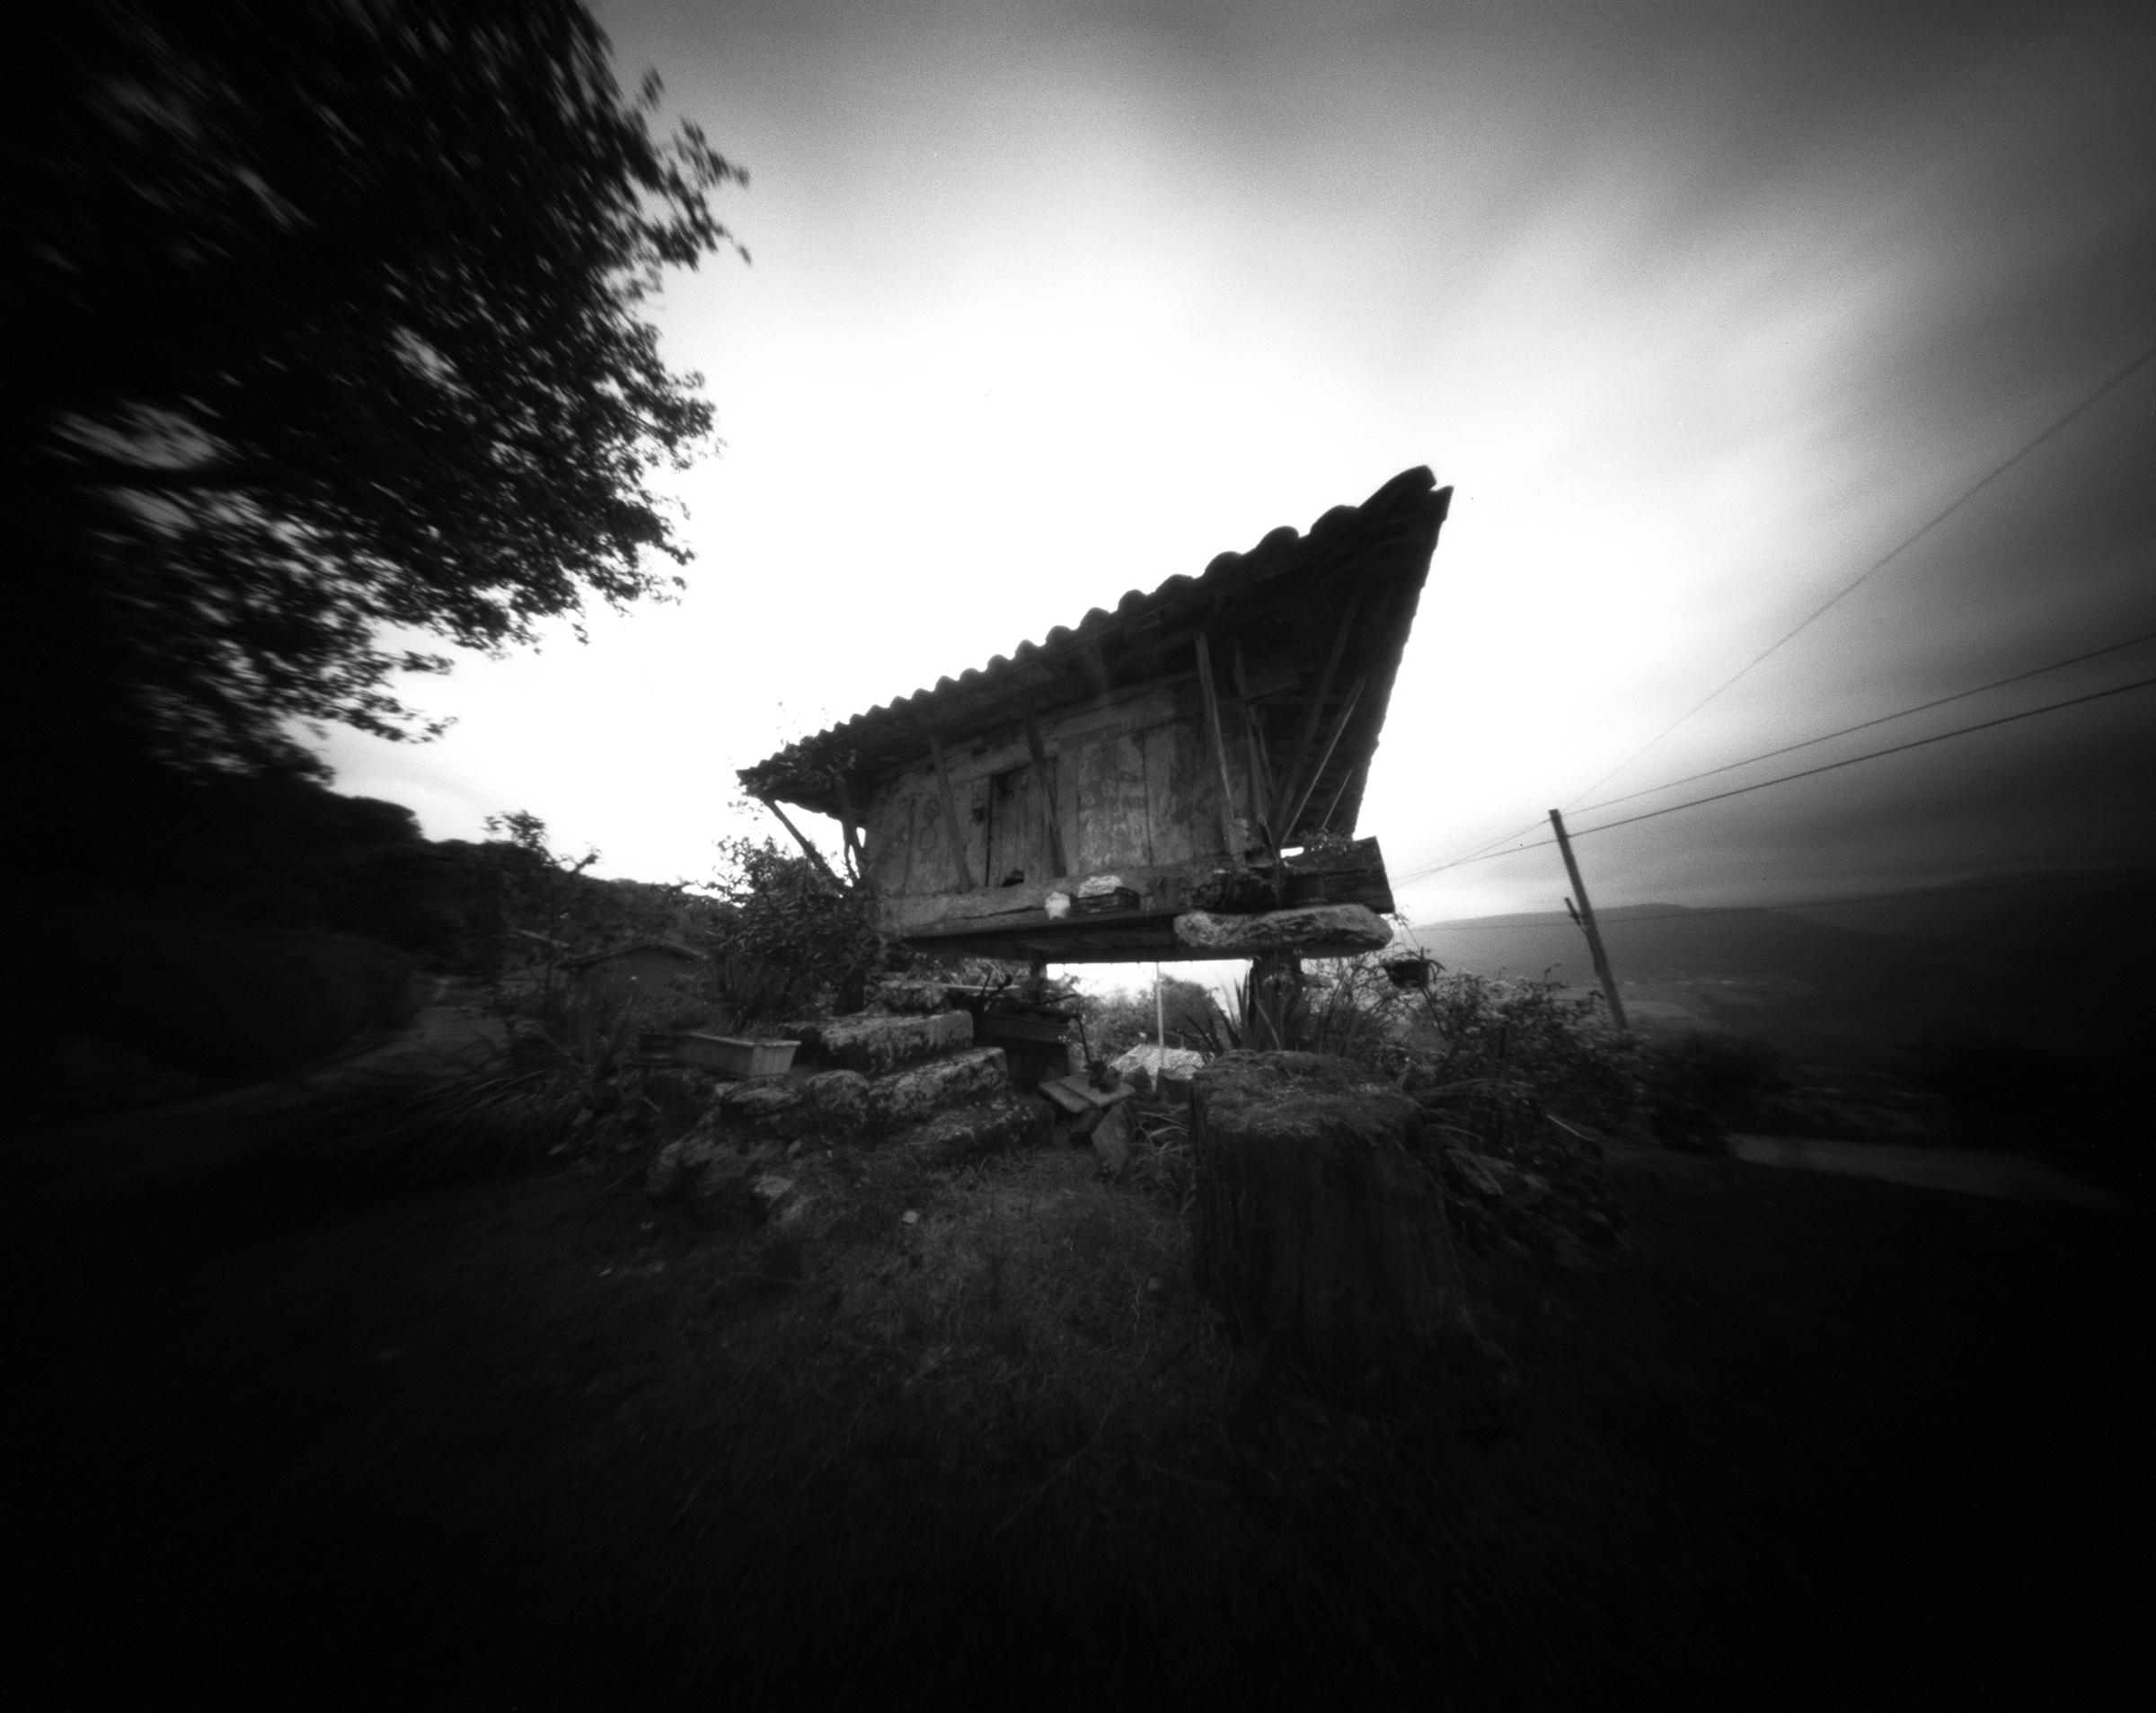 Horru - Argandenes, Asturias, Spain - Fomapan 200 ASA in a Zero Image 45 pinhole camera